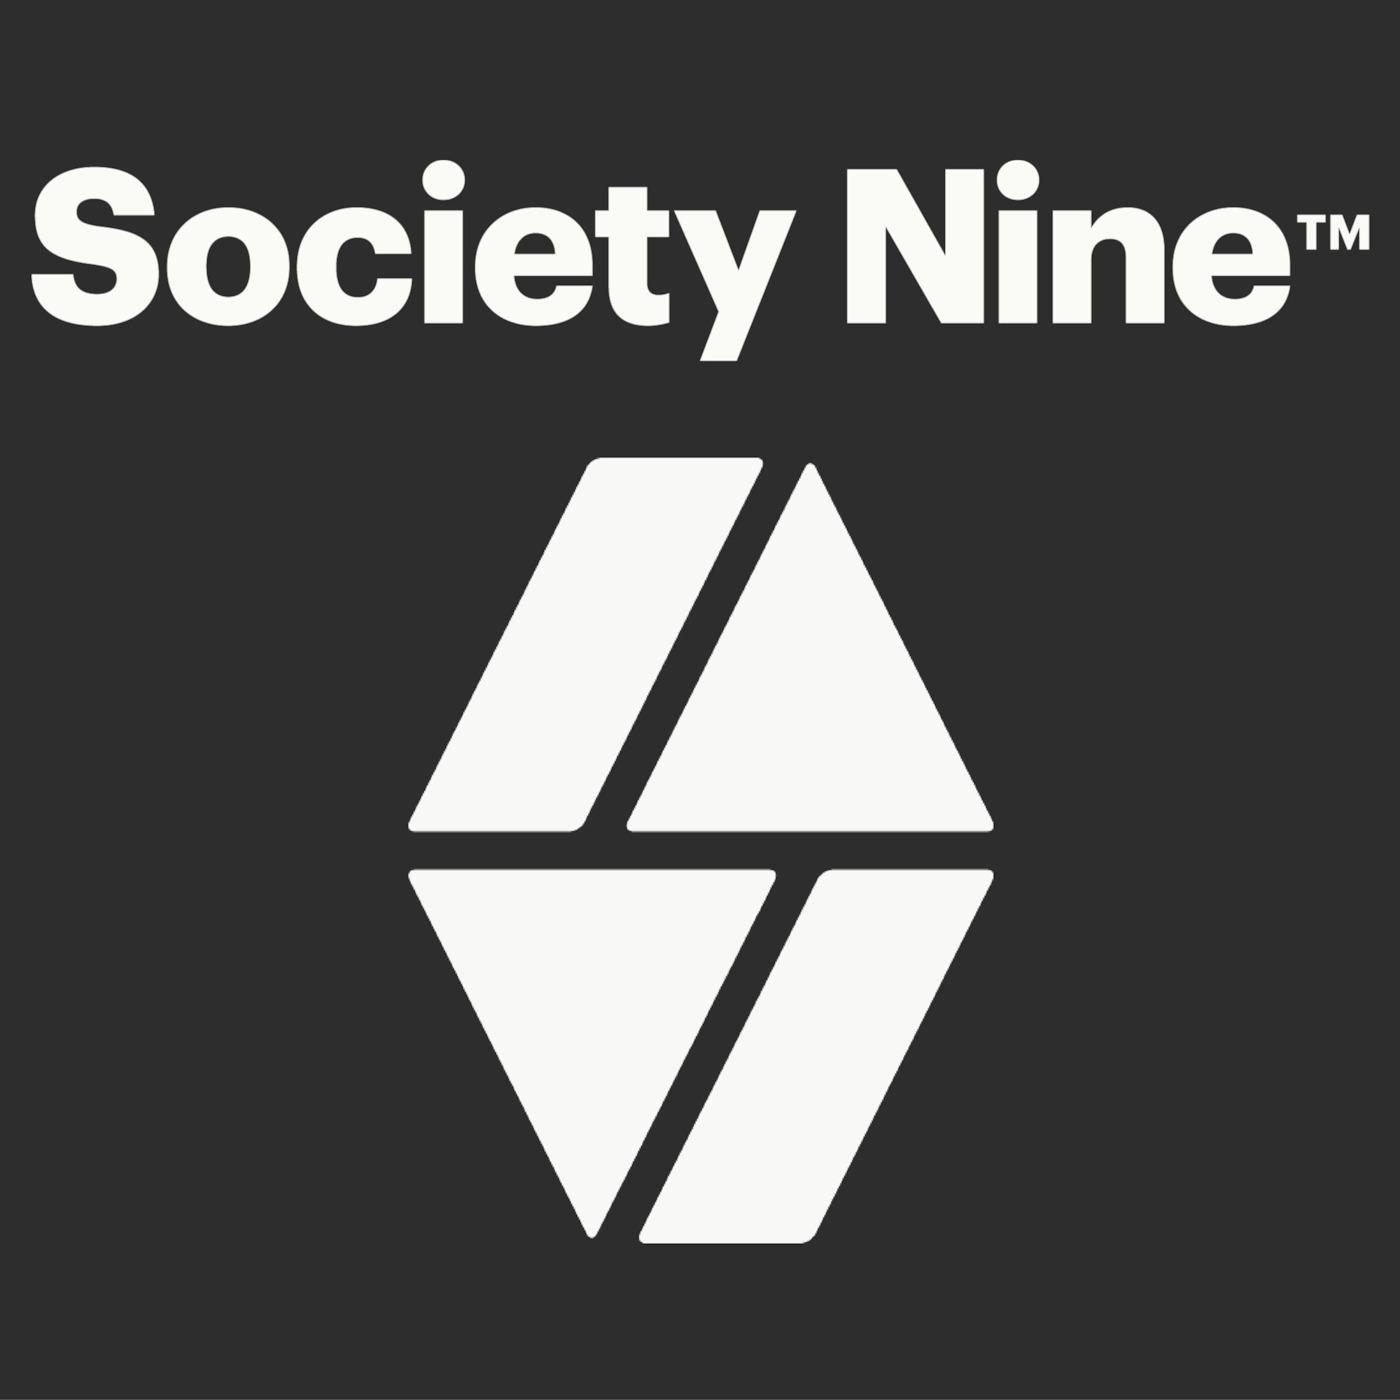 Society Nine's Podcast